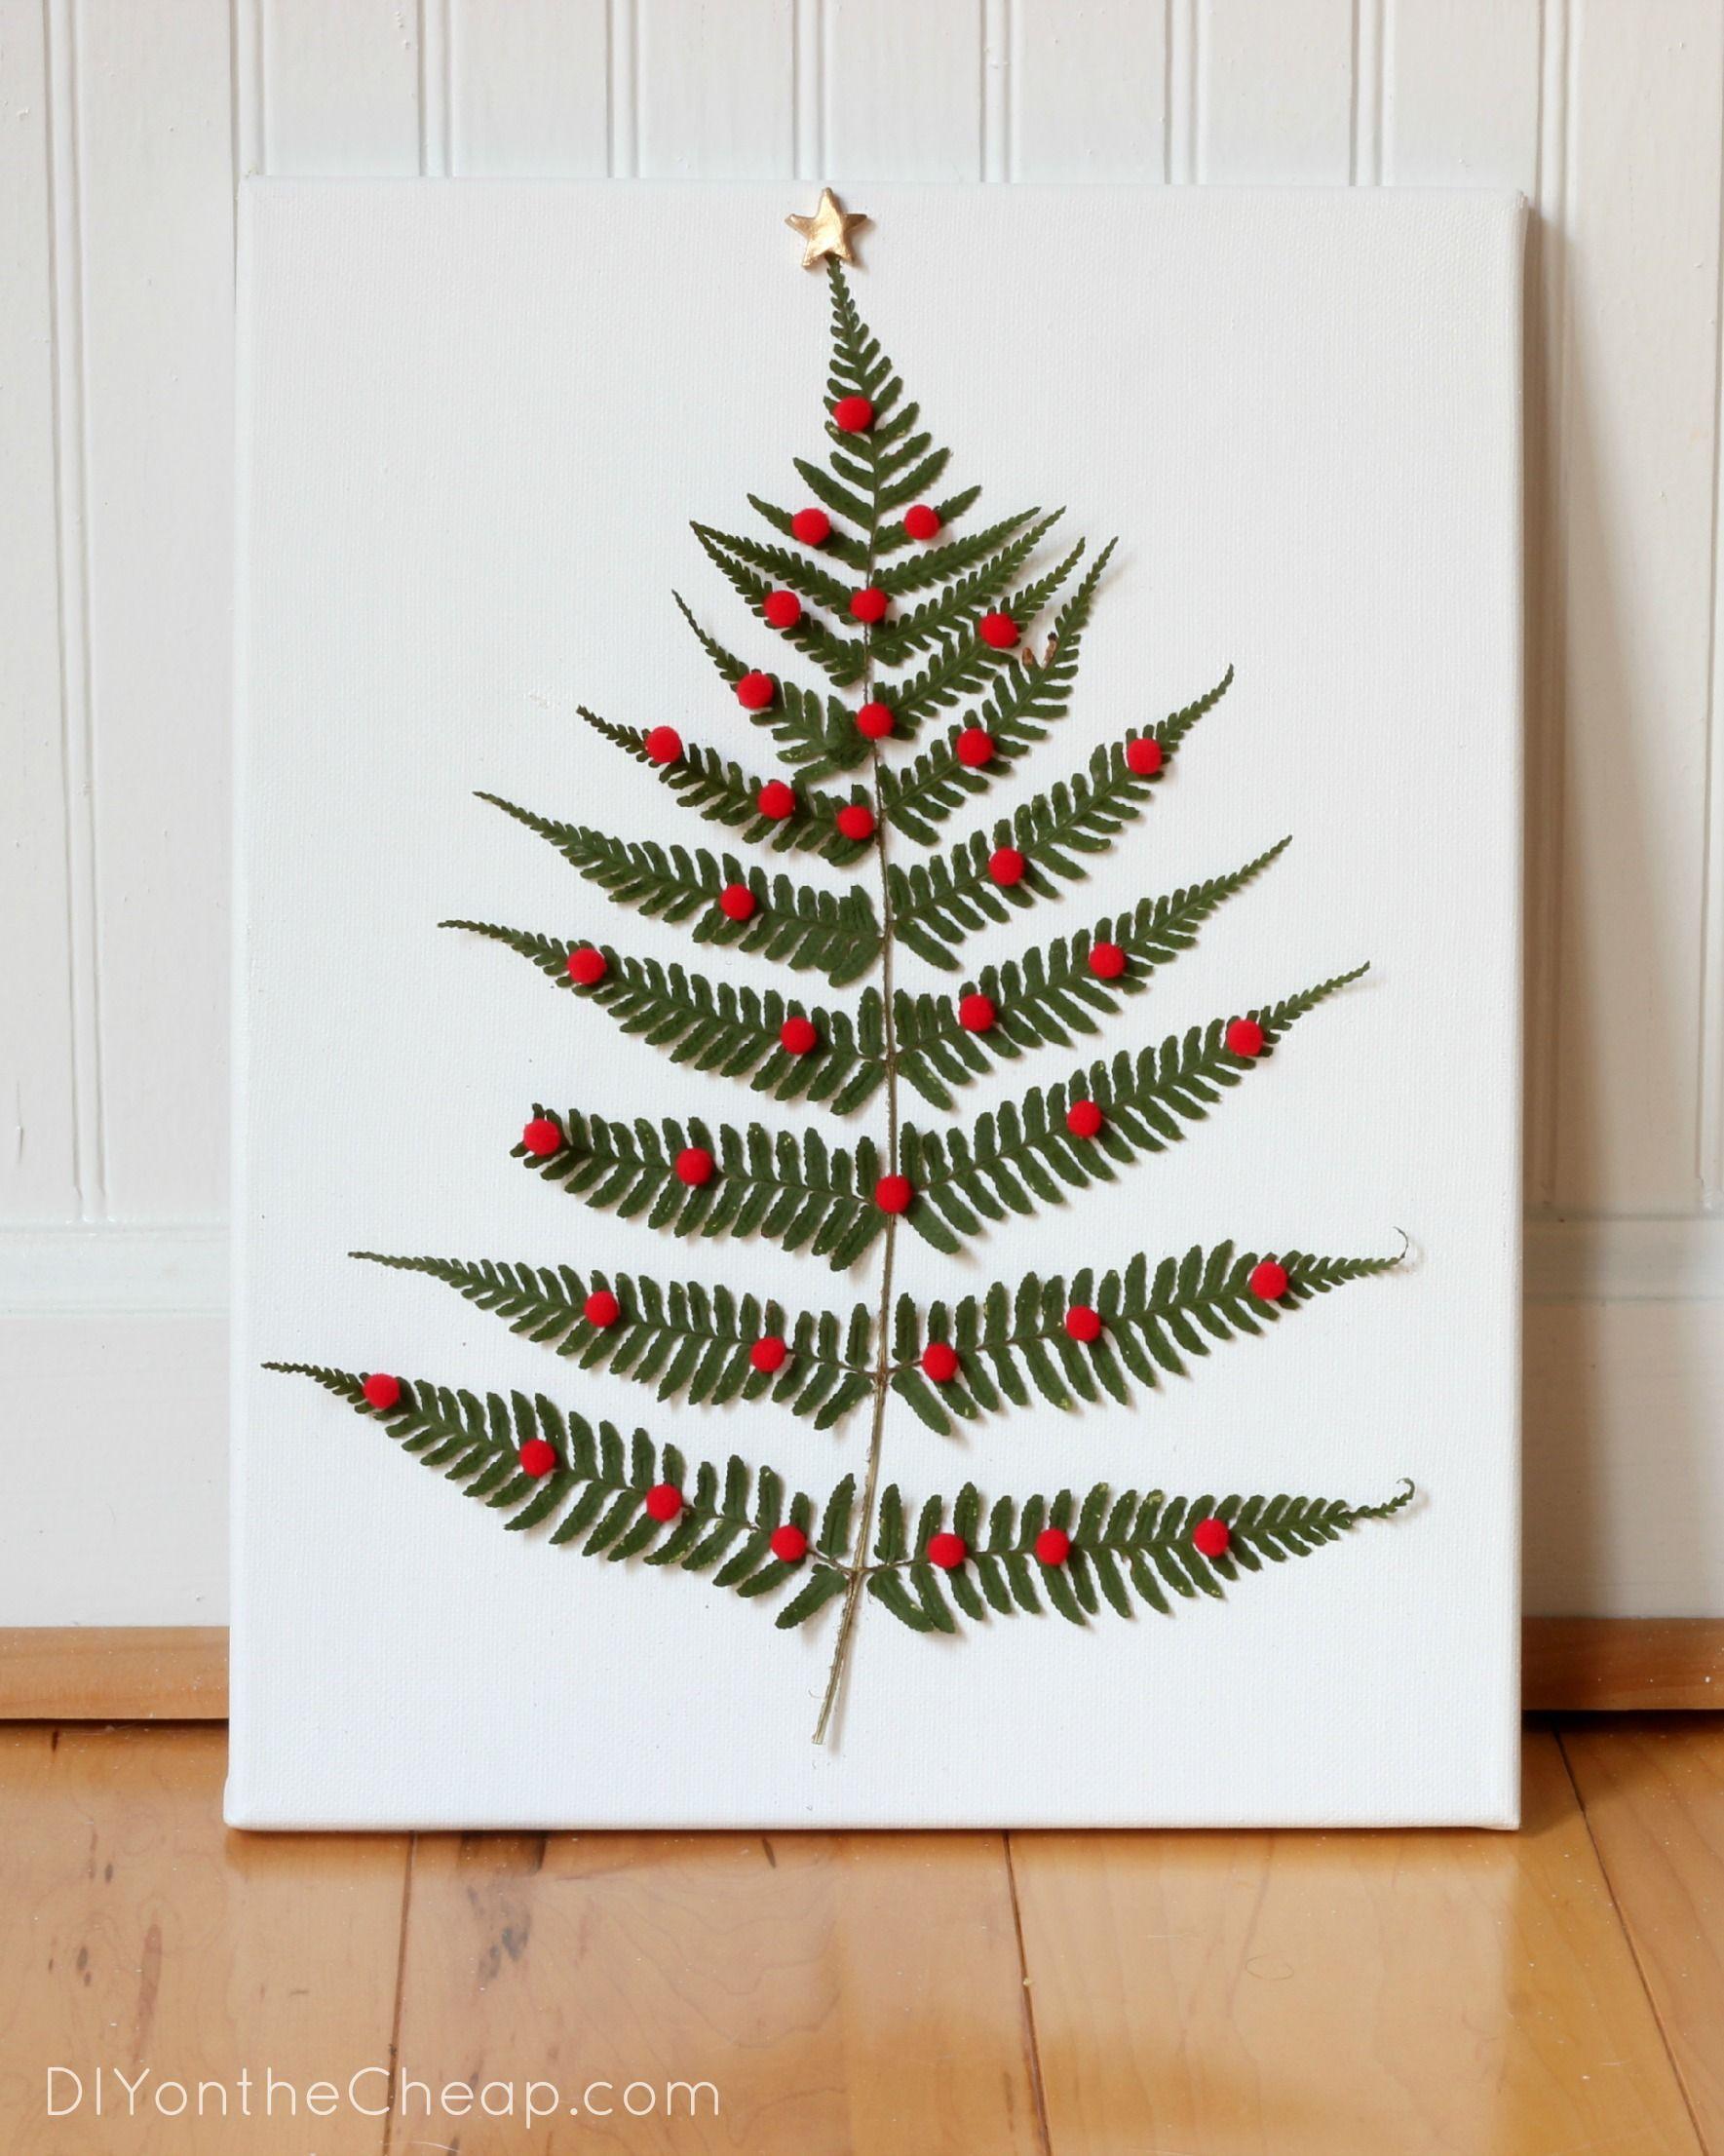 How To Make Fern Leaf Christmas Tree Art Tutorial Via Diy On The